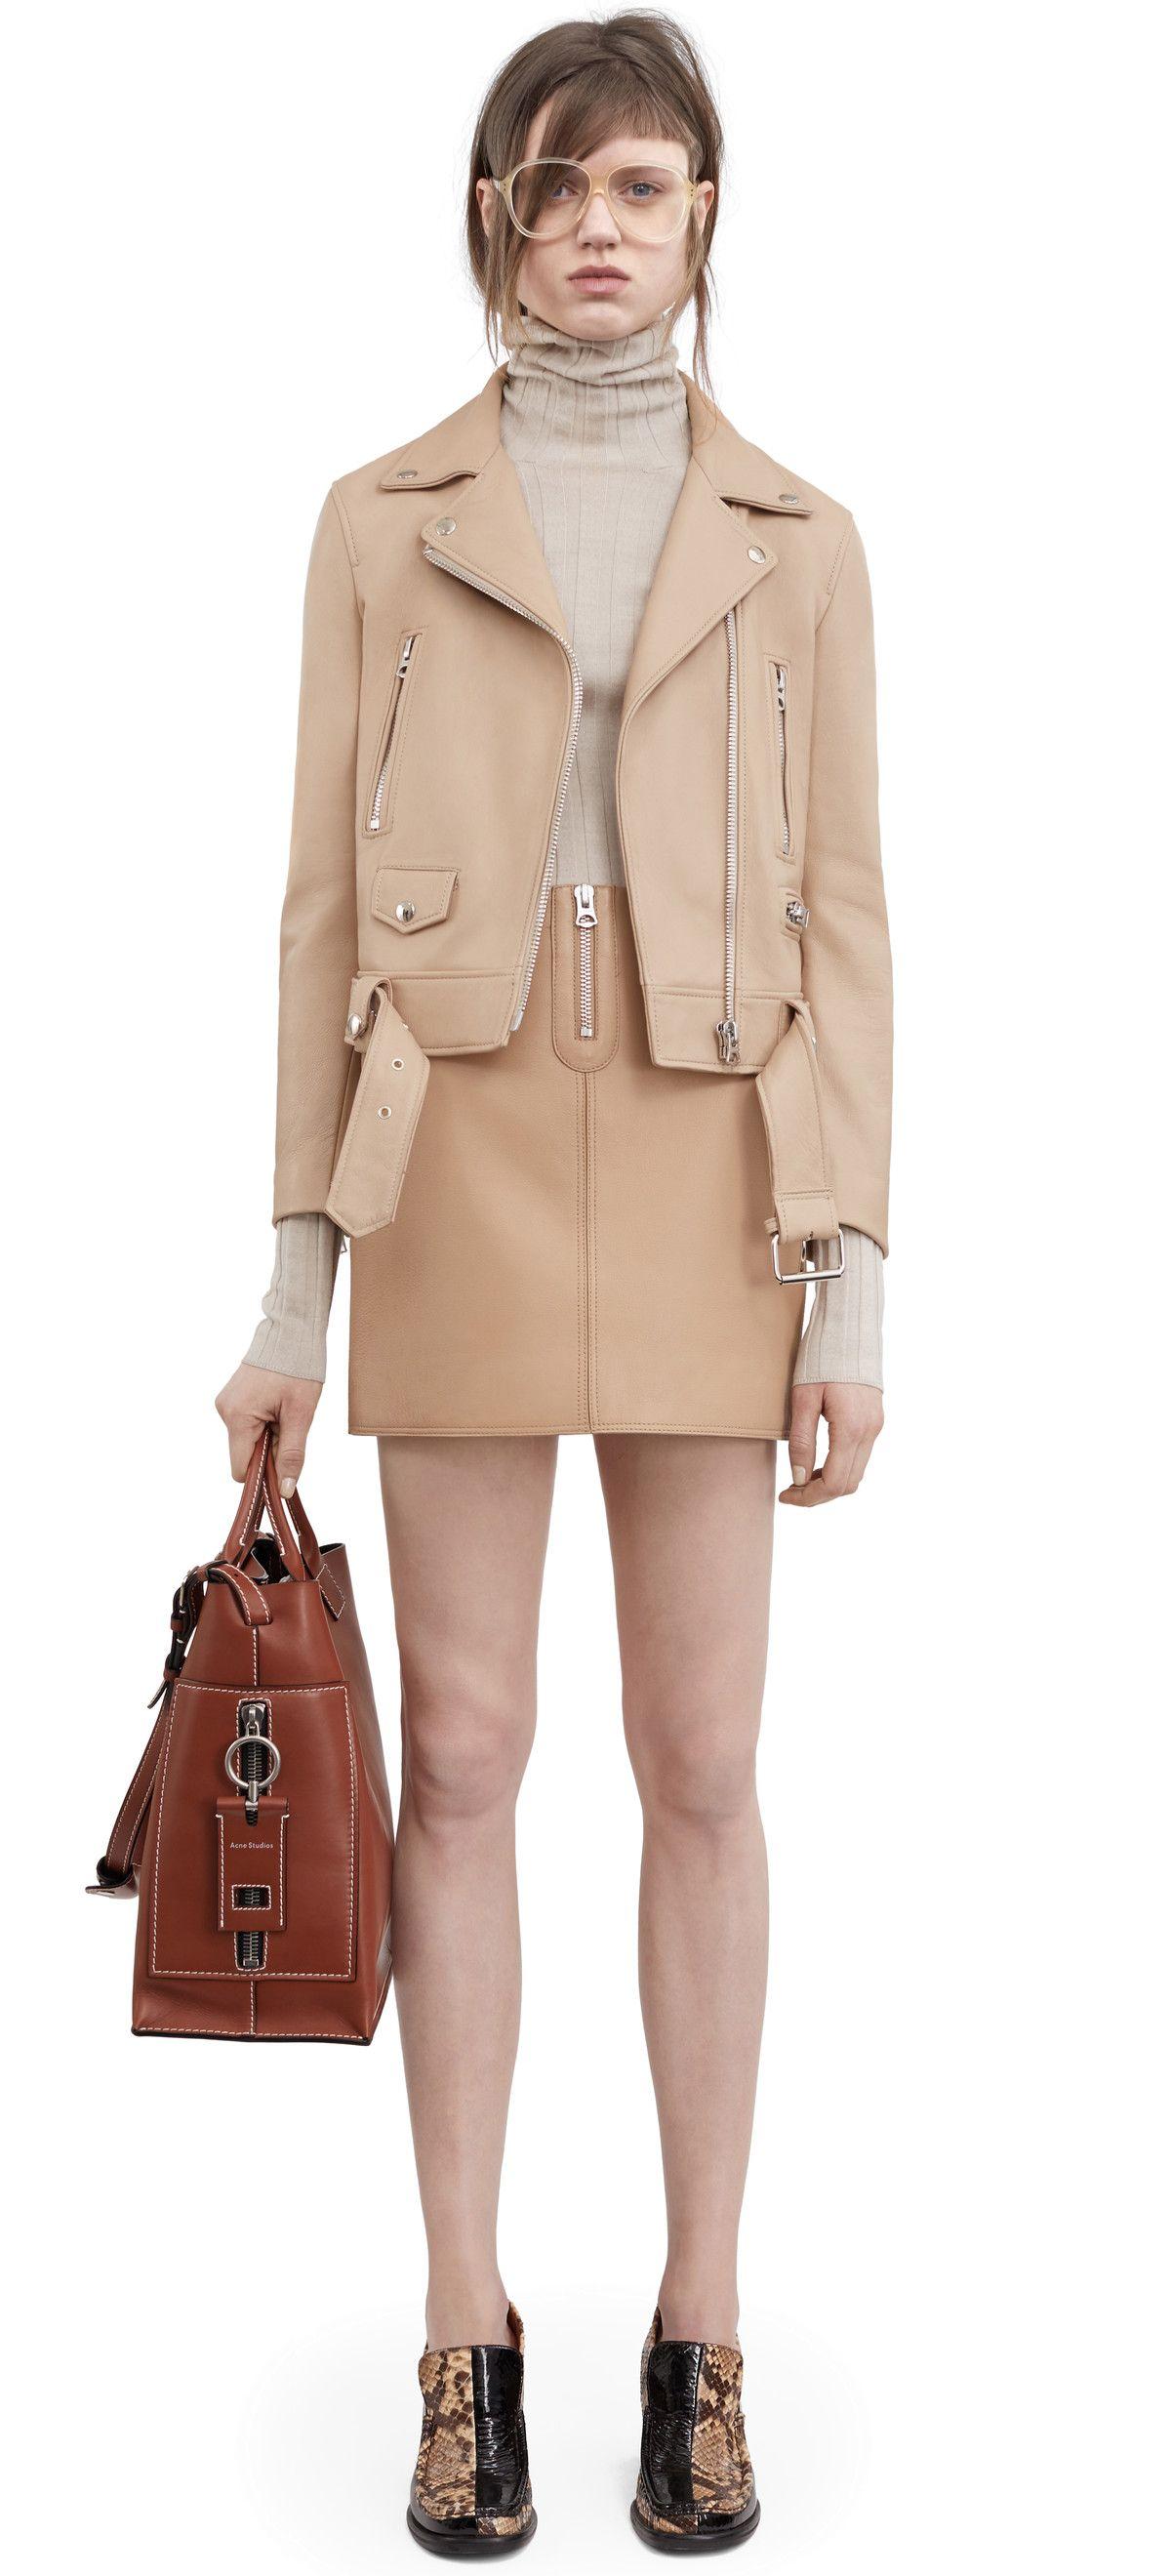 Acne Studios Leather Jacket Outfits Fashion Leather Jacket [ 2639 x 1200 Pixel ]